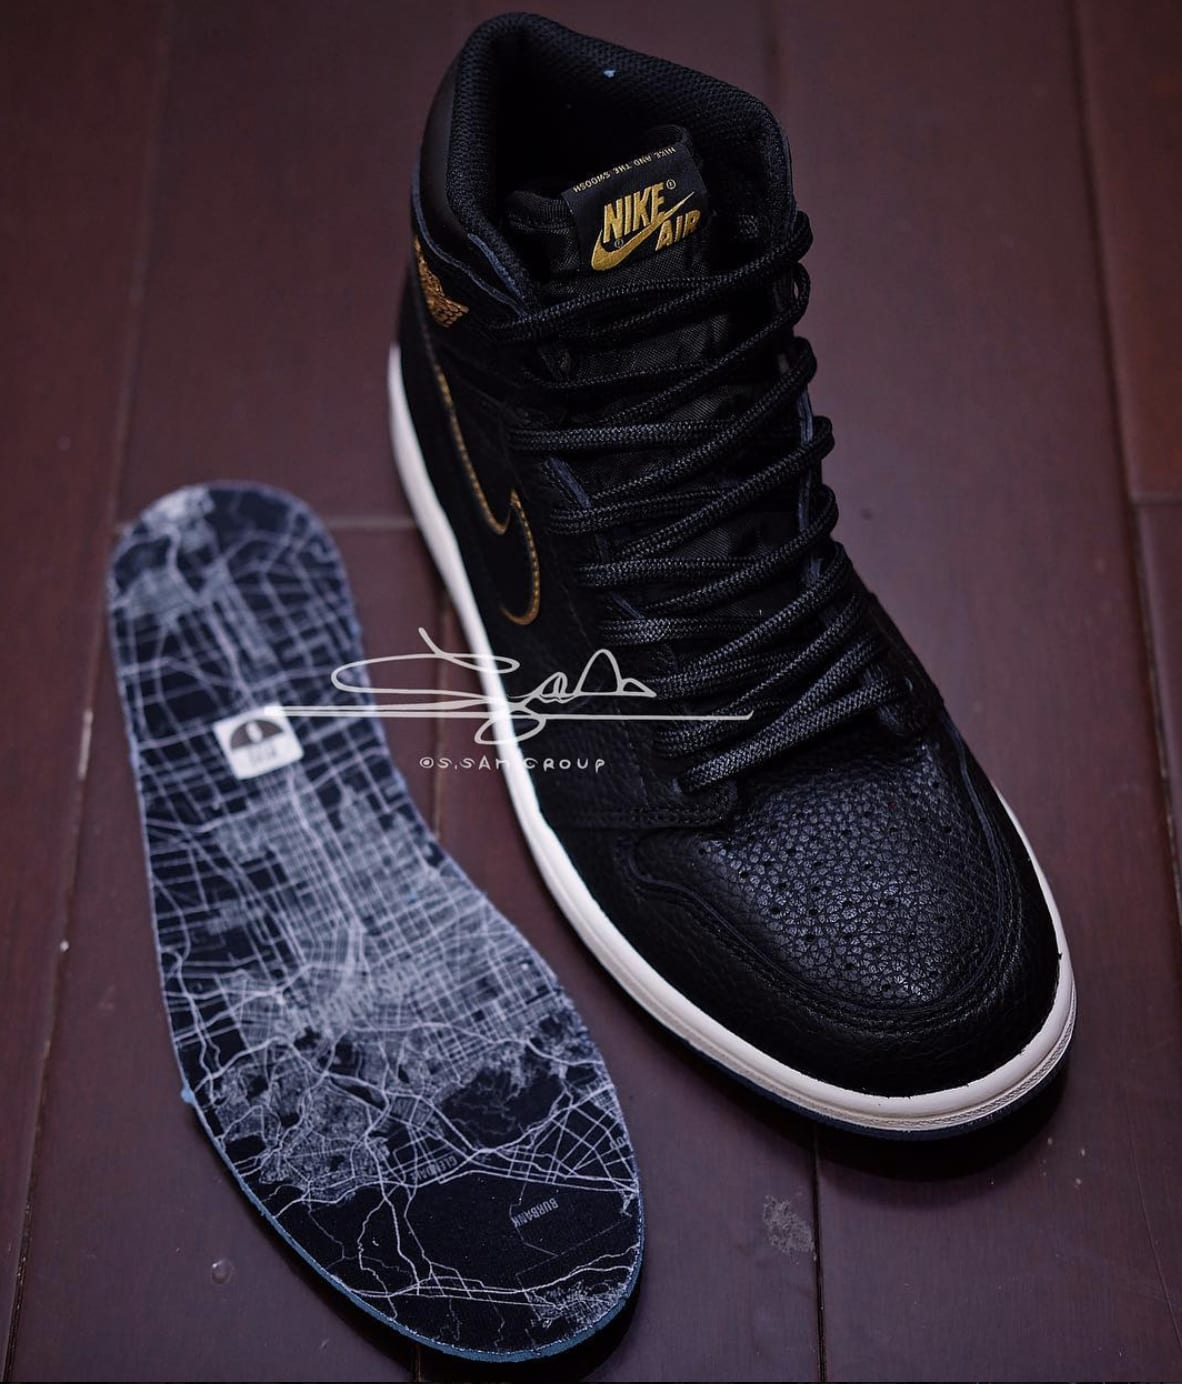 Gold Air Jordan Shoes